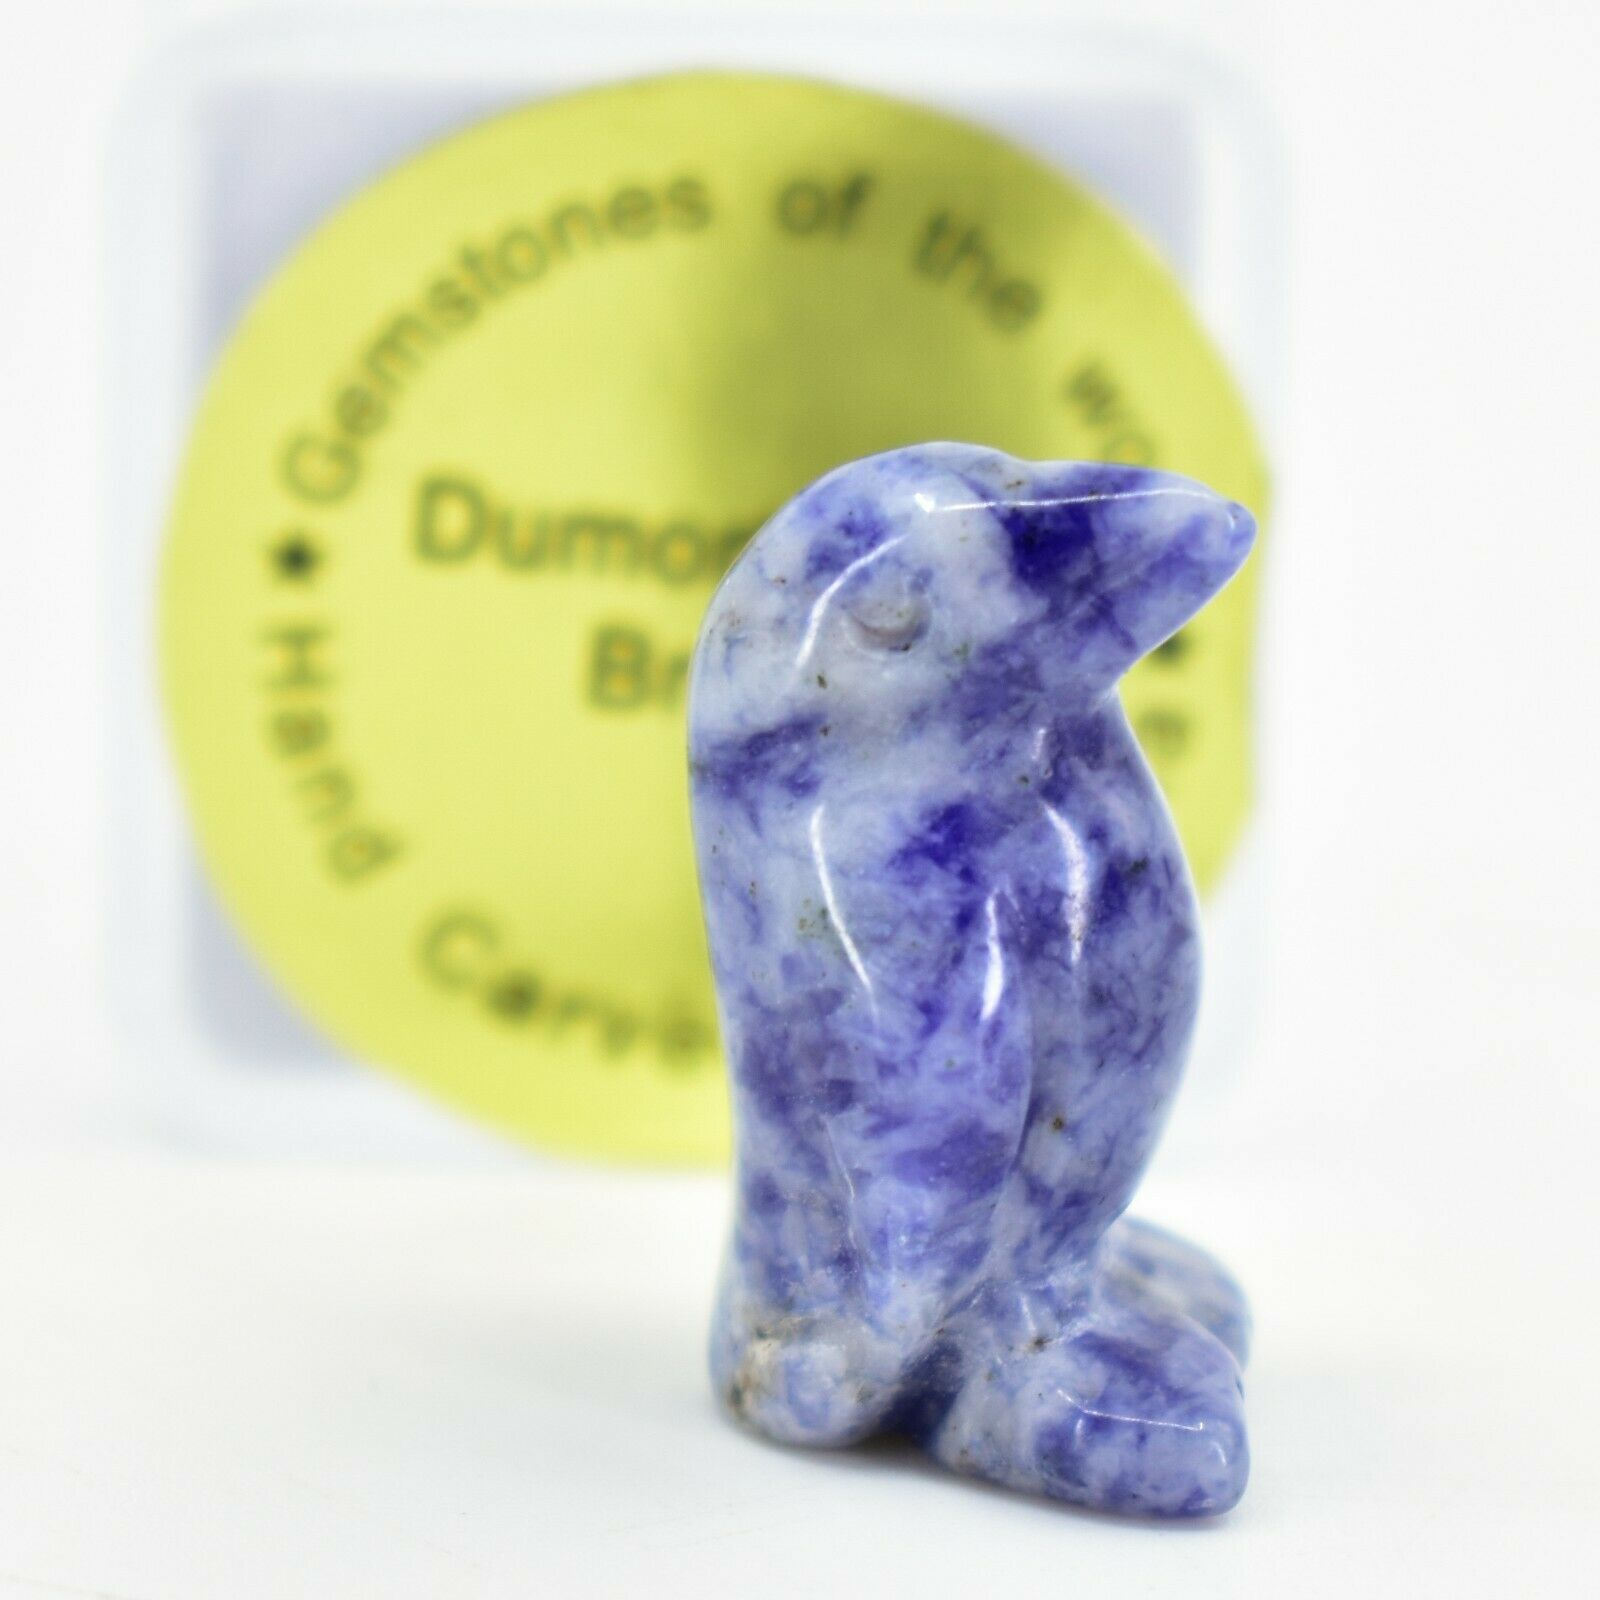 Dumortierite Gemstone Tiny Miniature Penguin Hand Carved Stone Figurine